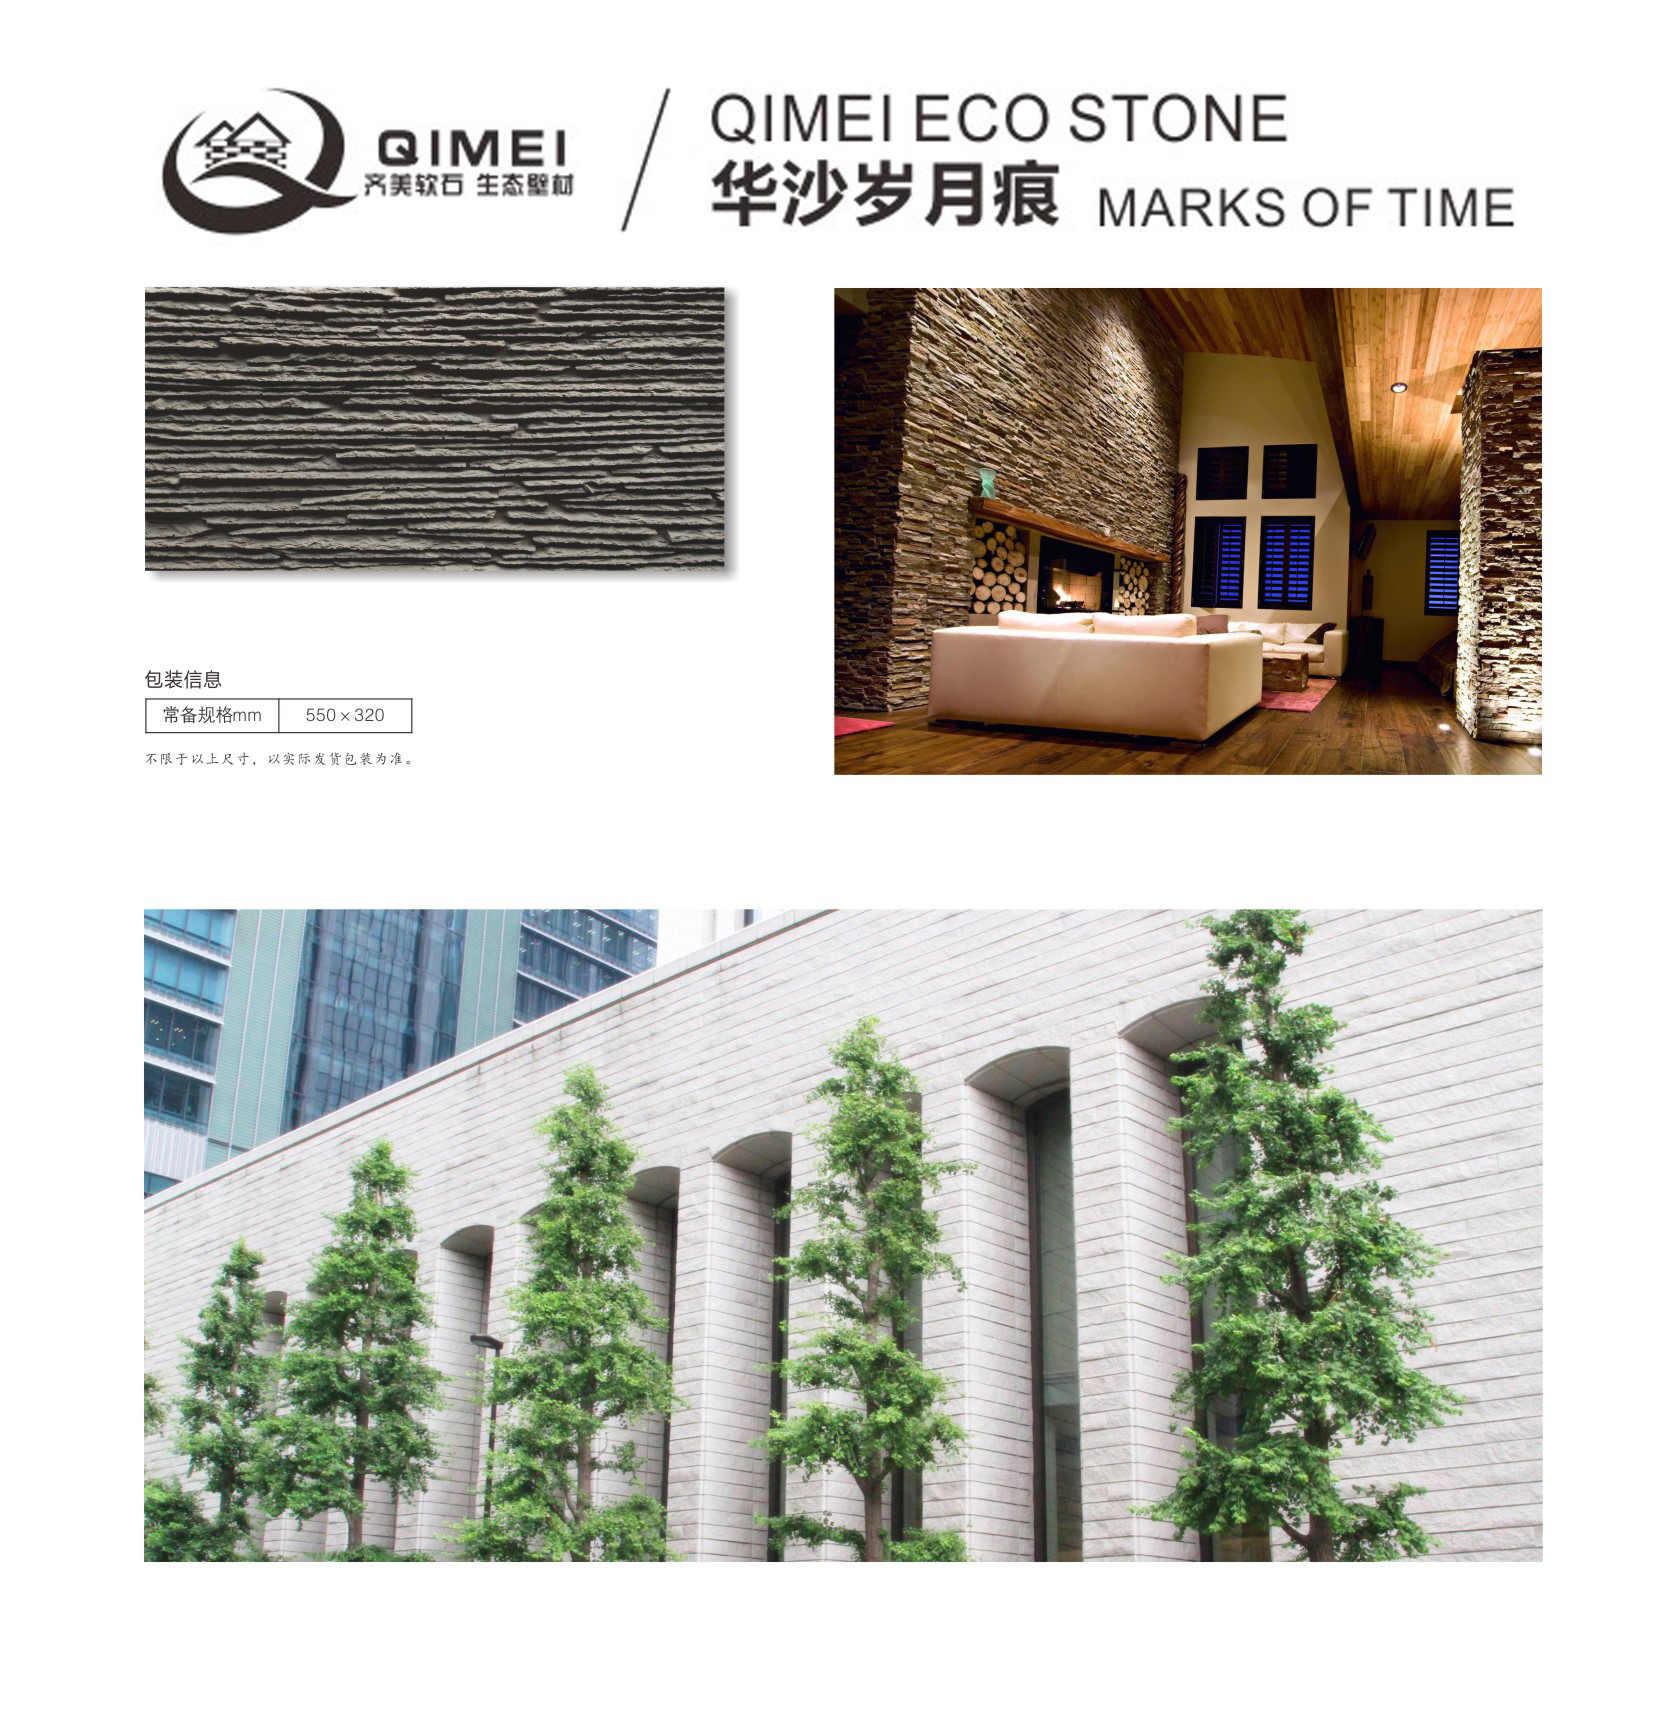 China baidai qimei mark of time flexible and soft stone